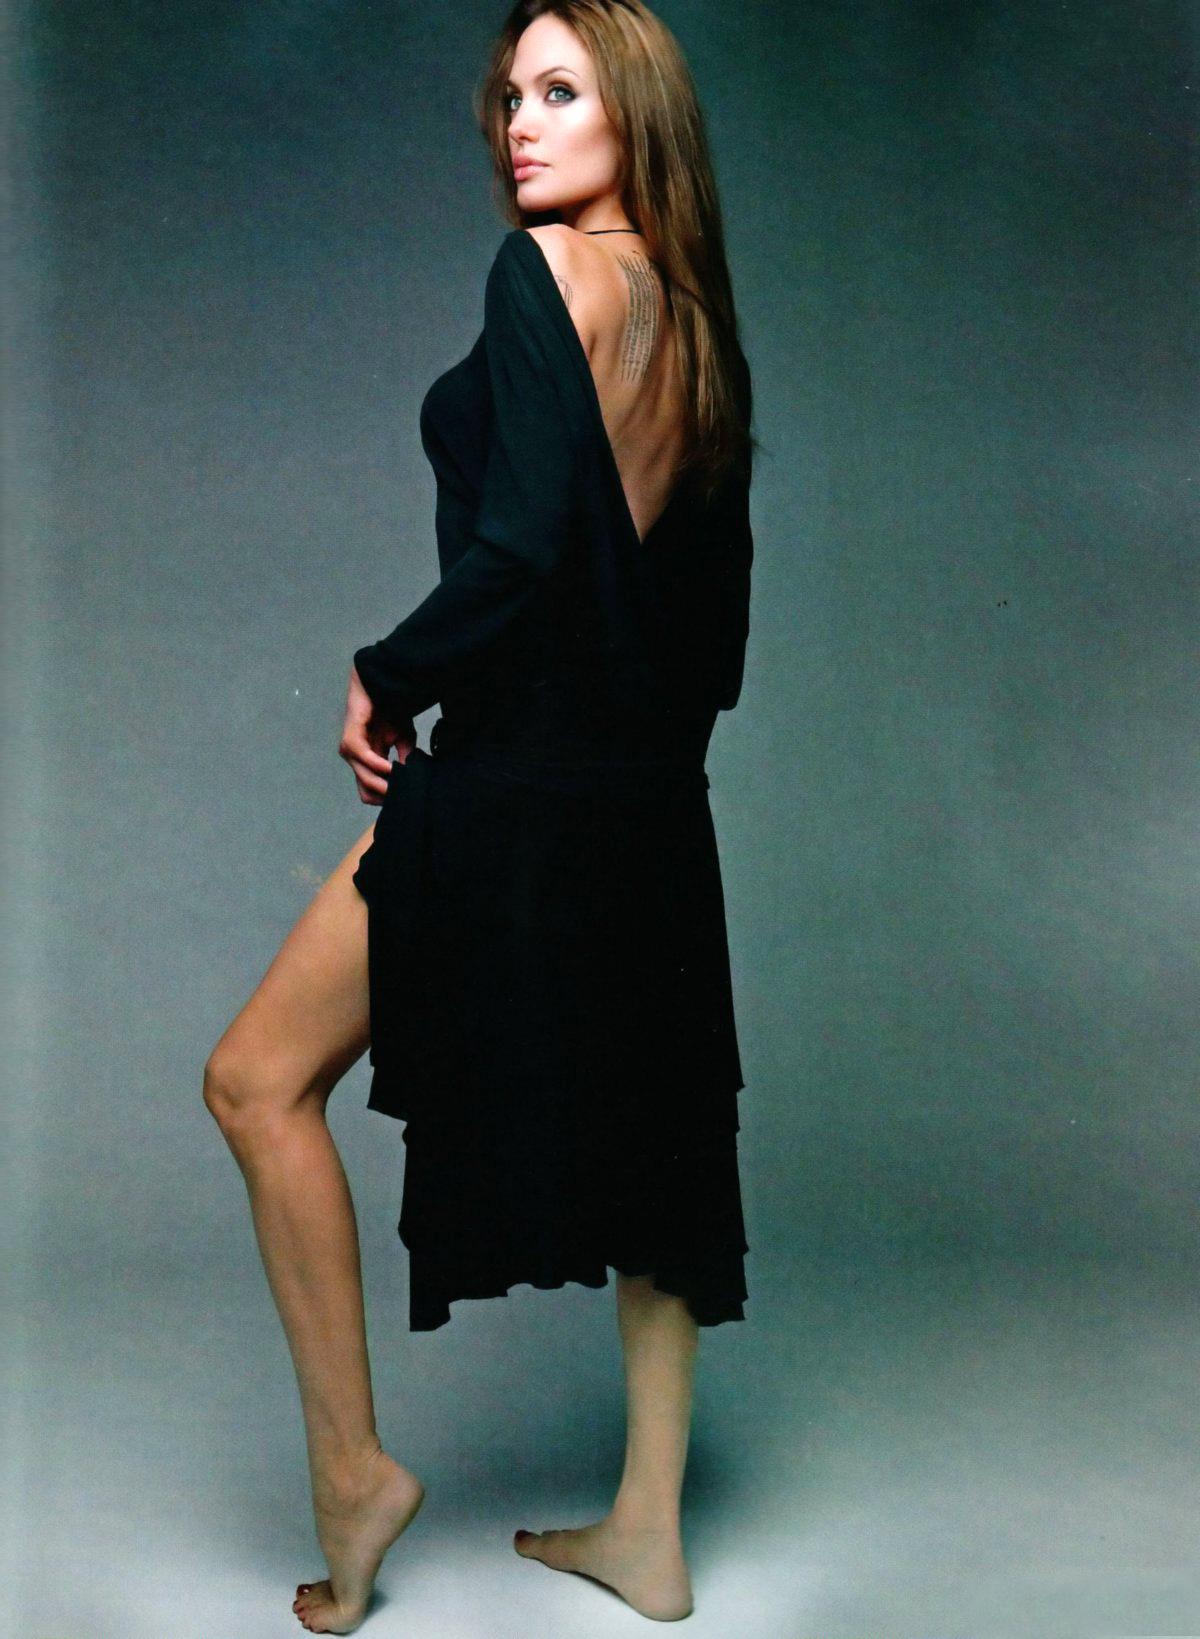 Angelina Jolie Sexy Feet 7